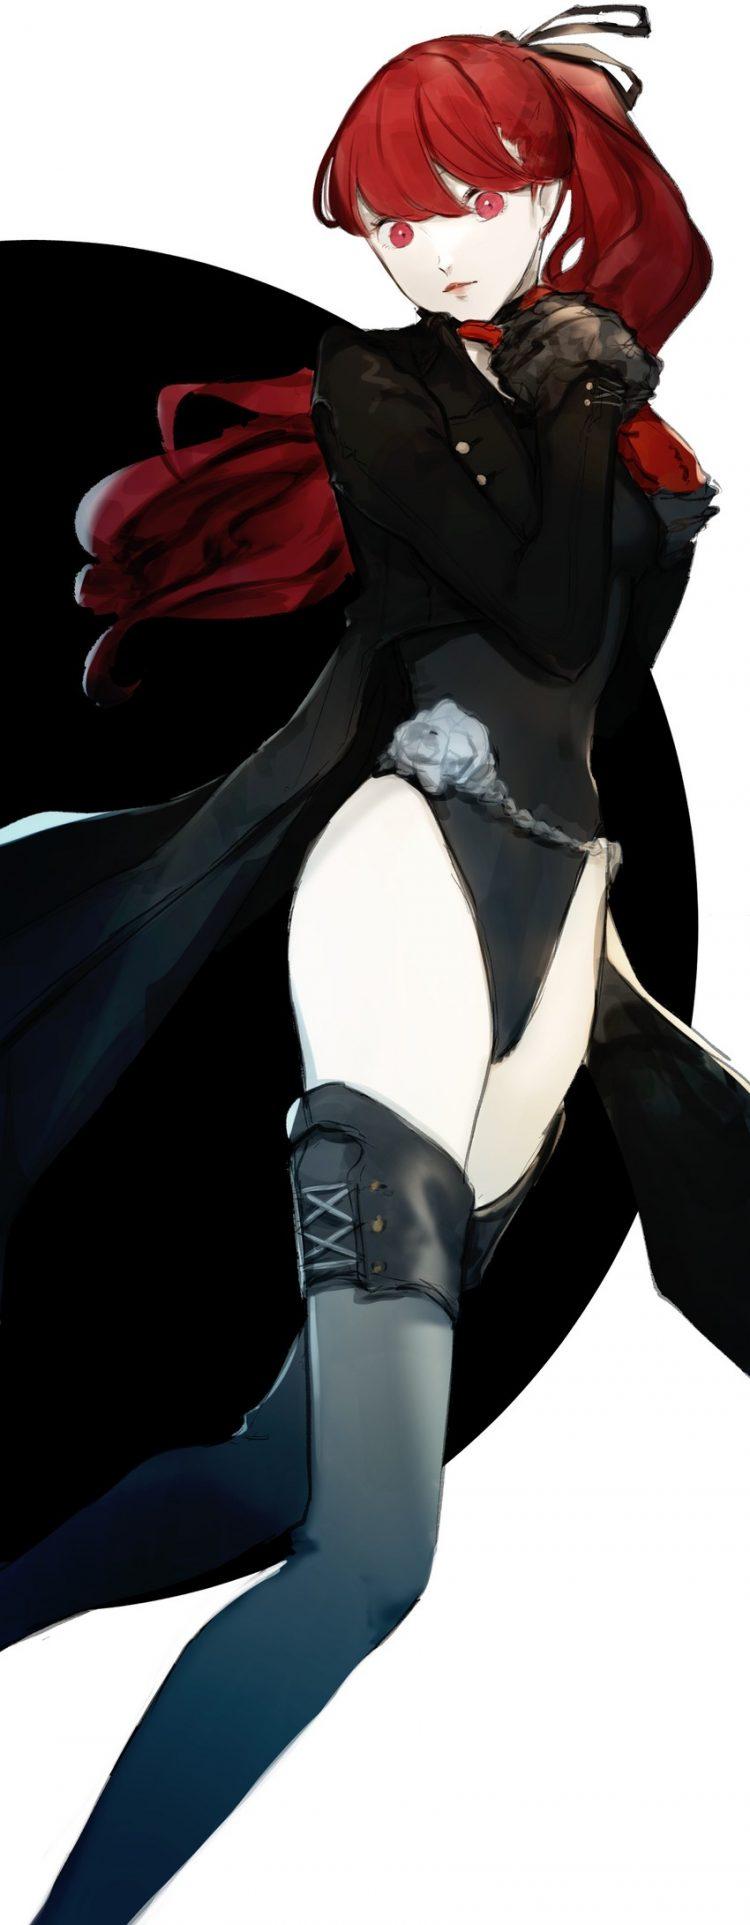 yoshizawa kasumi persona125 - 【ペルソナ5ザ・ロイヤル】芳澤かすみちゃんのエロ画像:イラスト その4